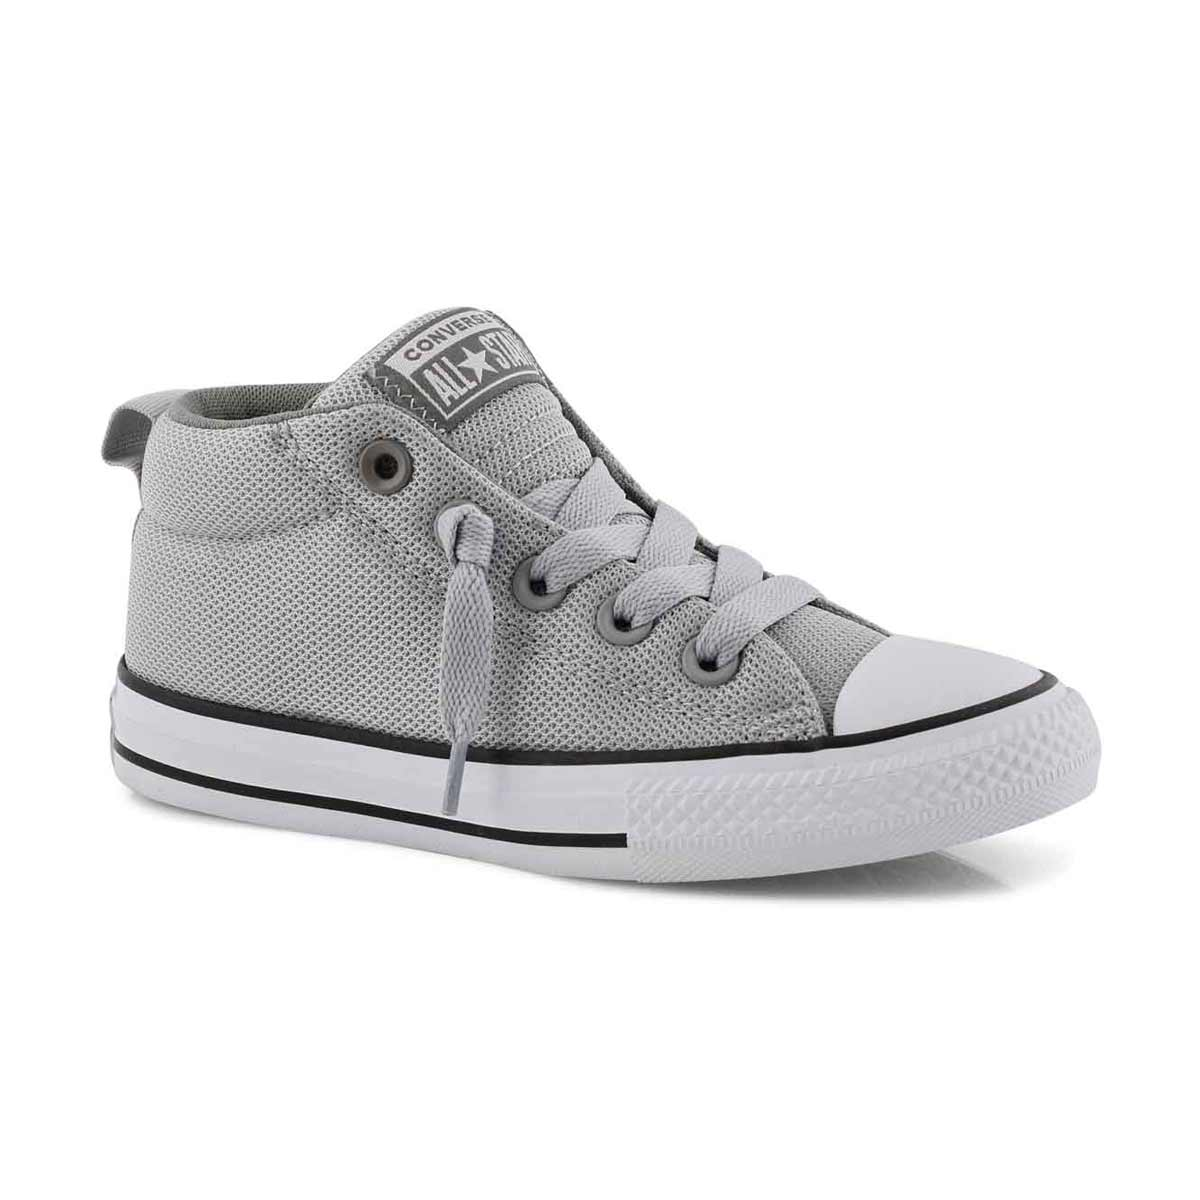 Bys CTAS Street Mid grey/mason sneaker